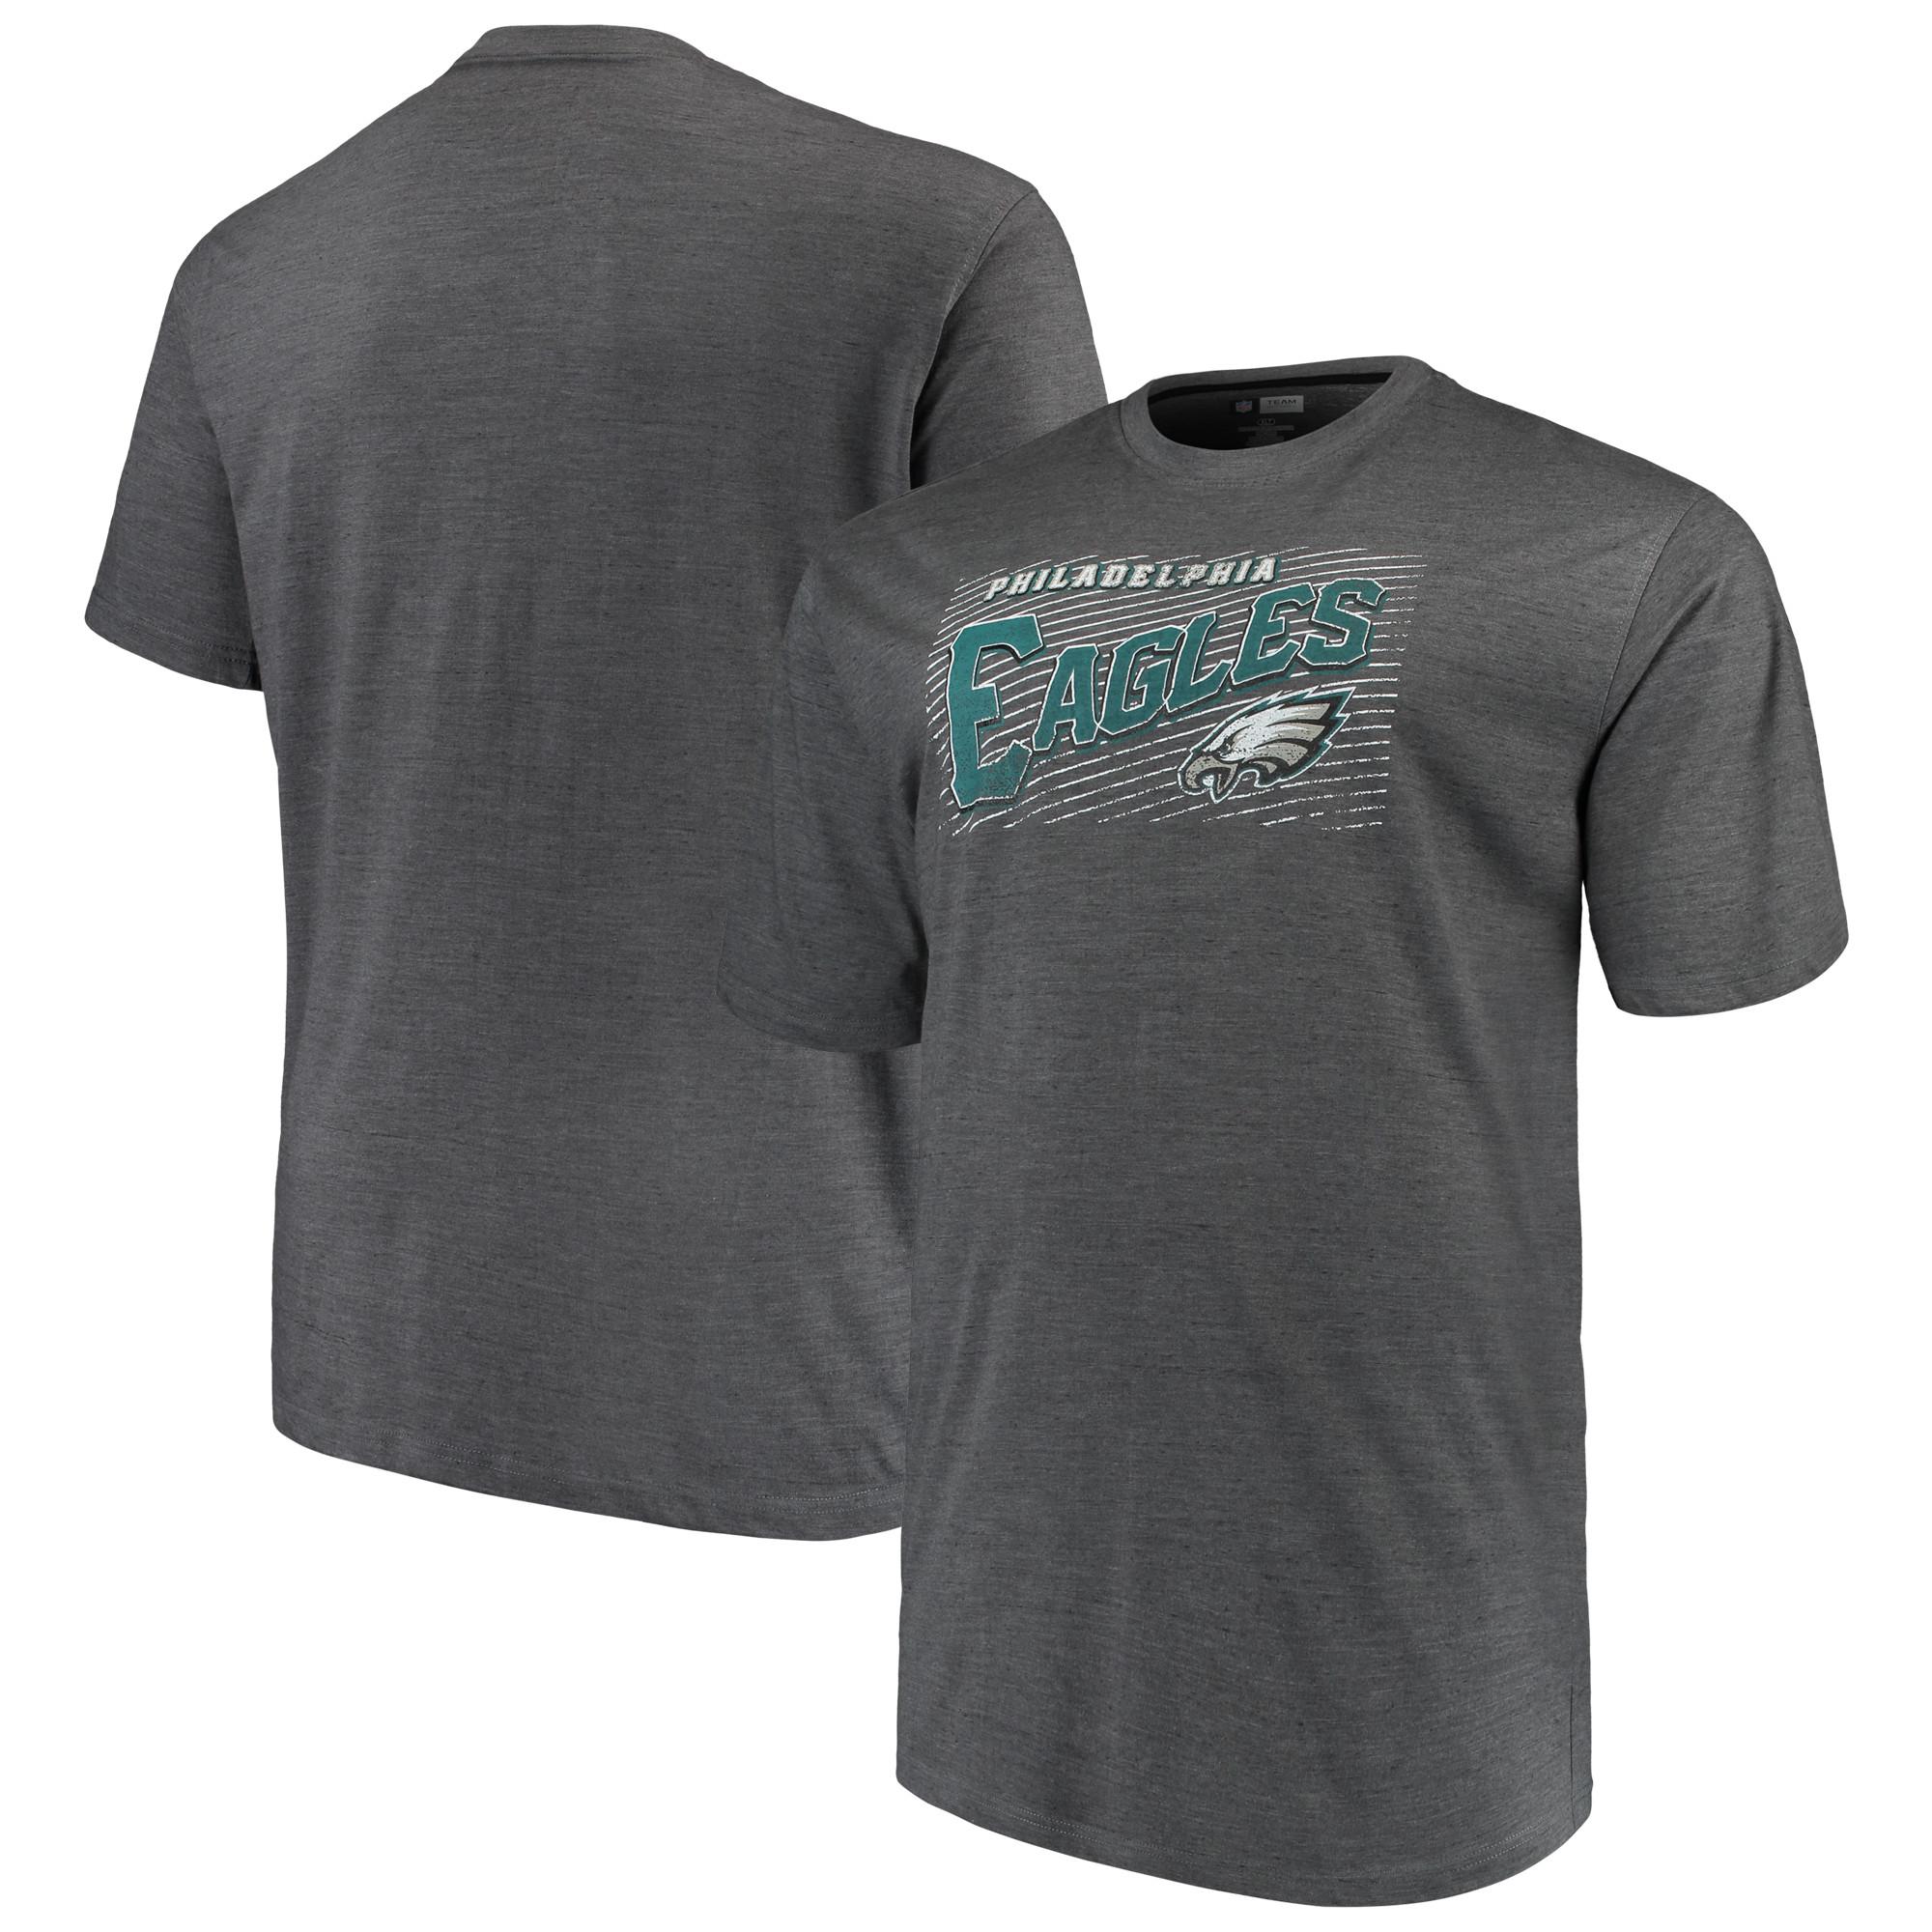 Men's Majestic Charcoal Philadelphia Eagles Big & Tall Royal Domination Malt T-Shirt